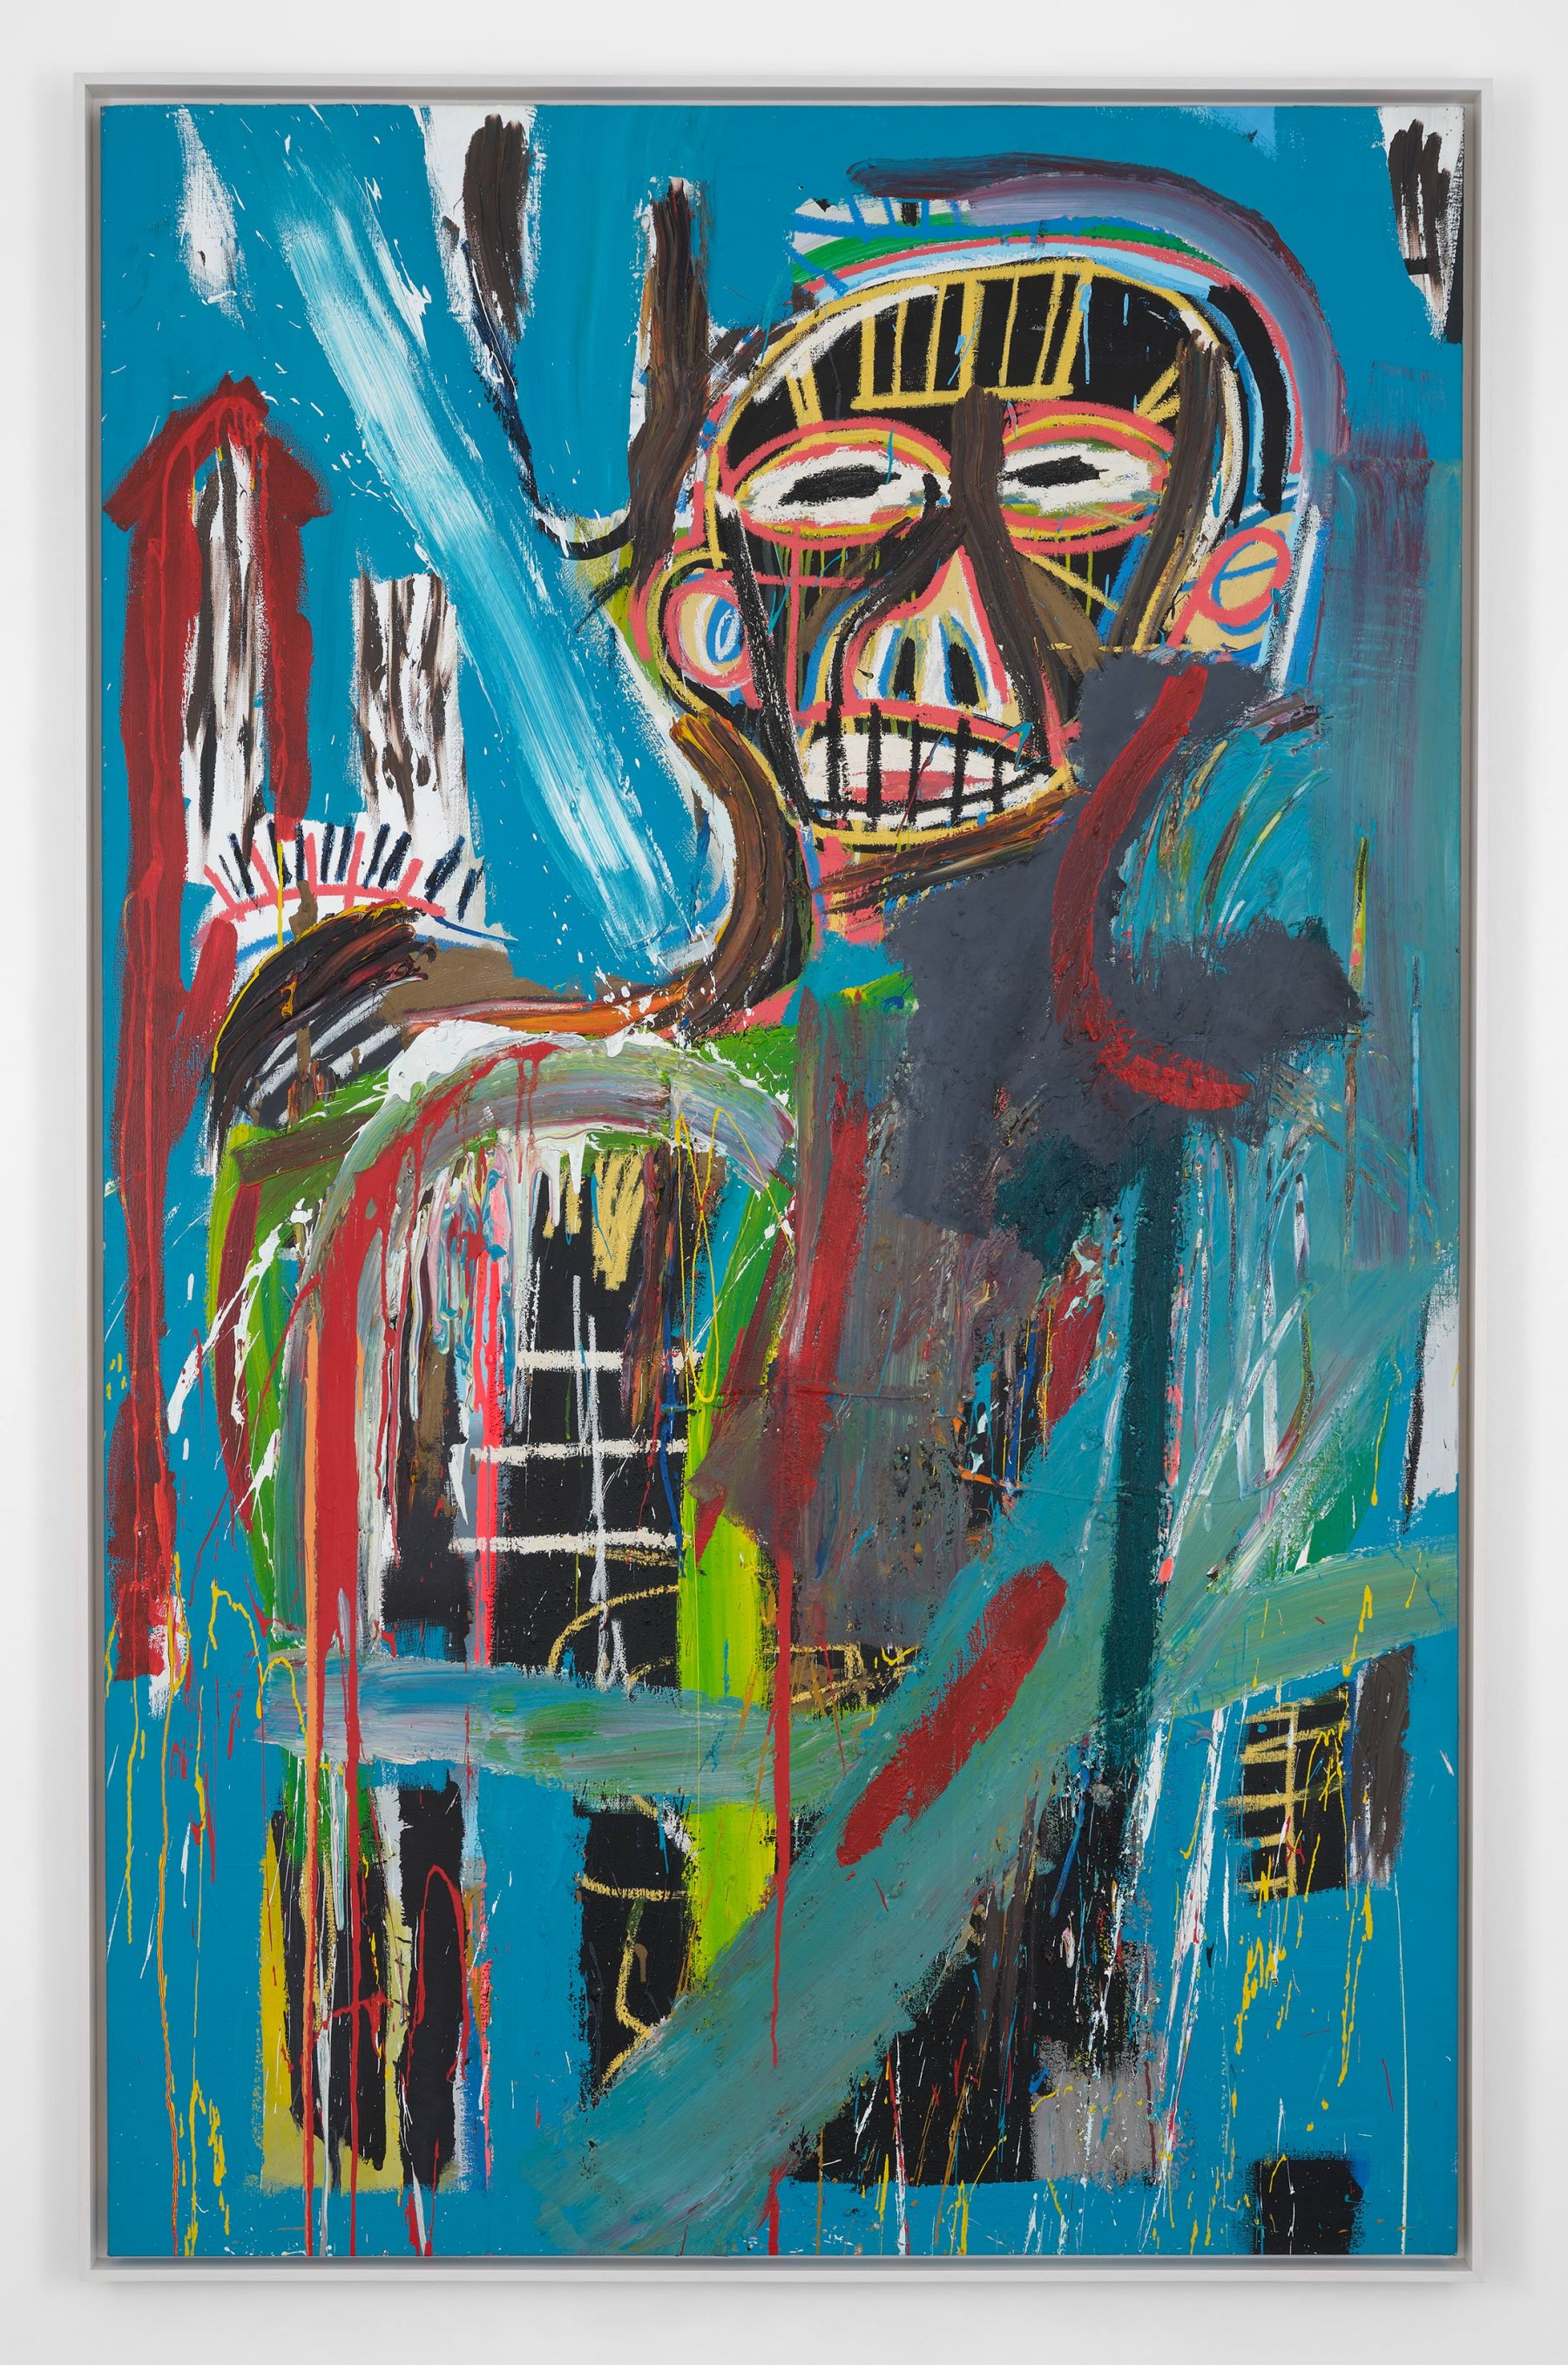 Basquiat_Untitled_1982 (LG-10337-19) framed